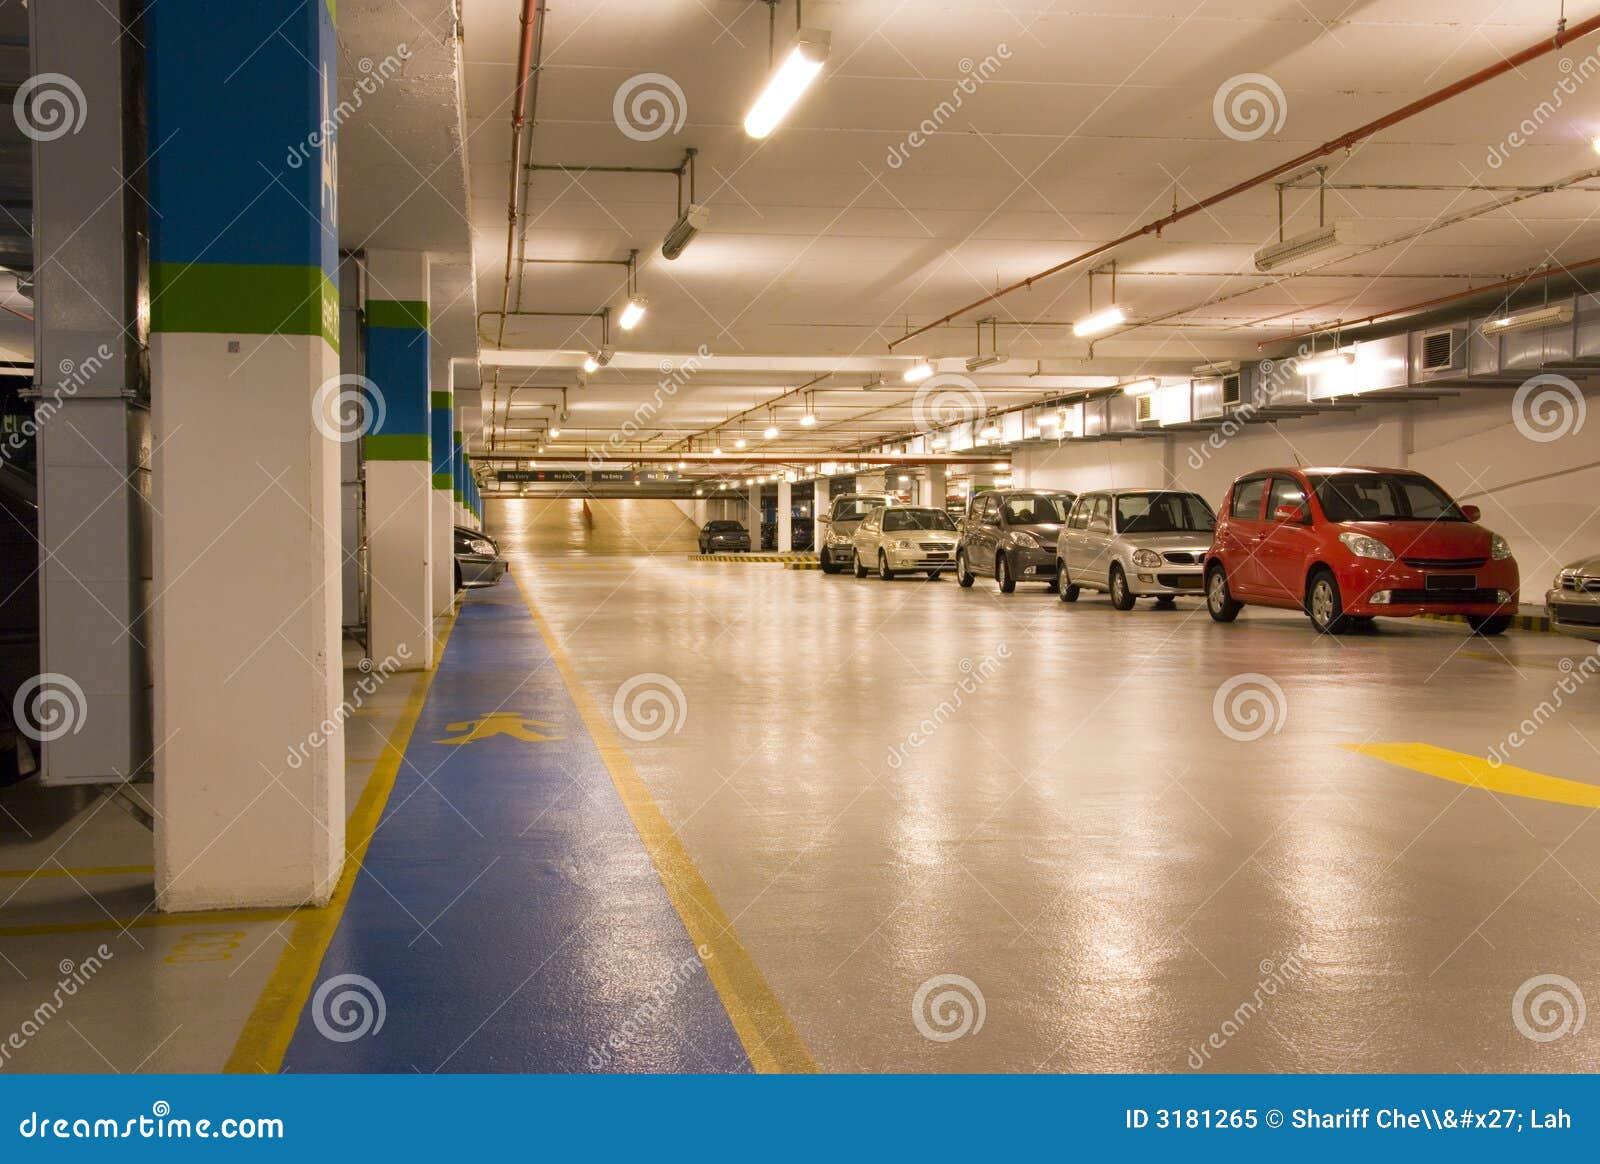 Basement Car Park Stock Image Image Of Carpark